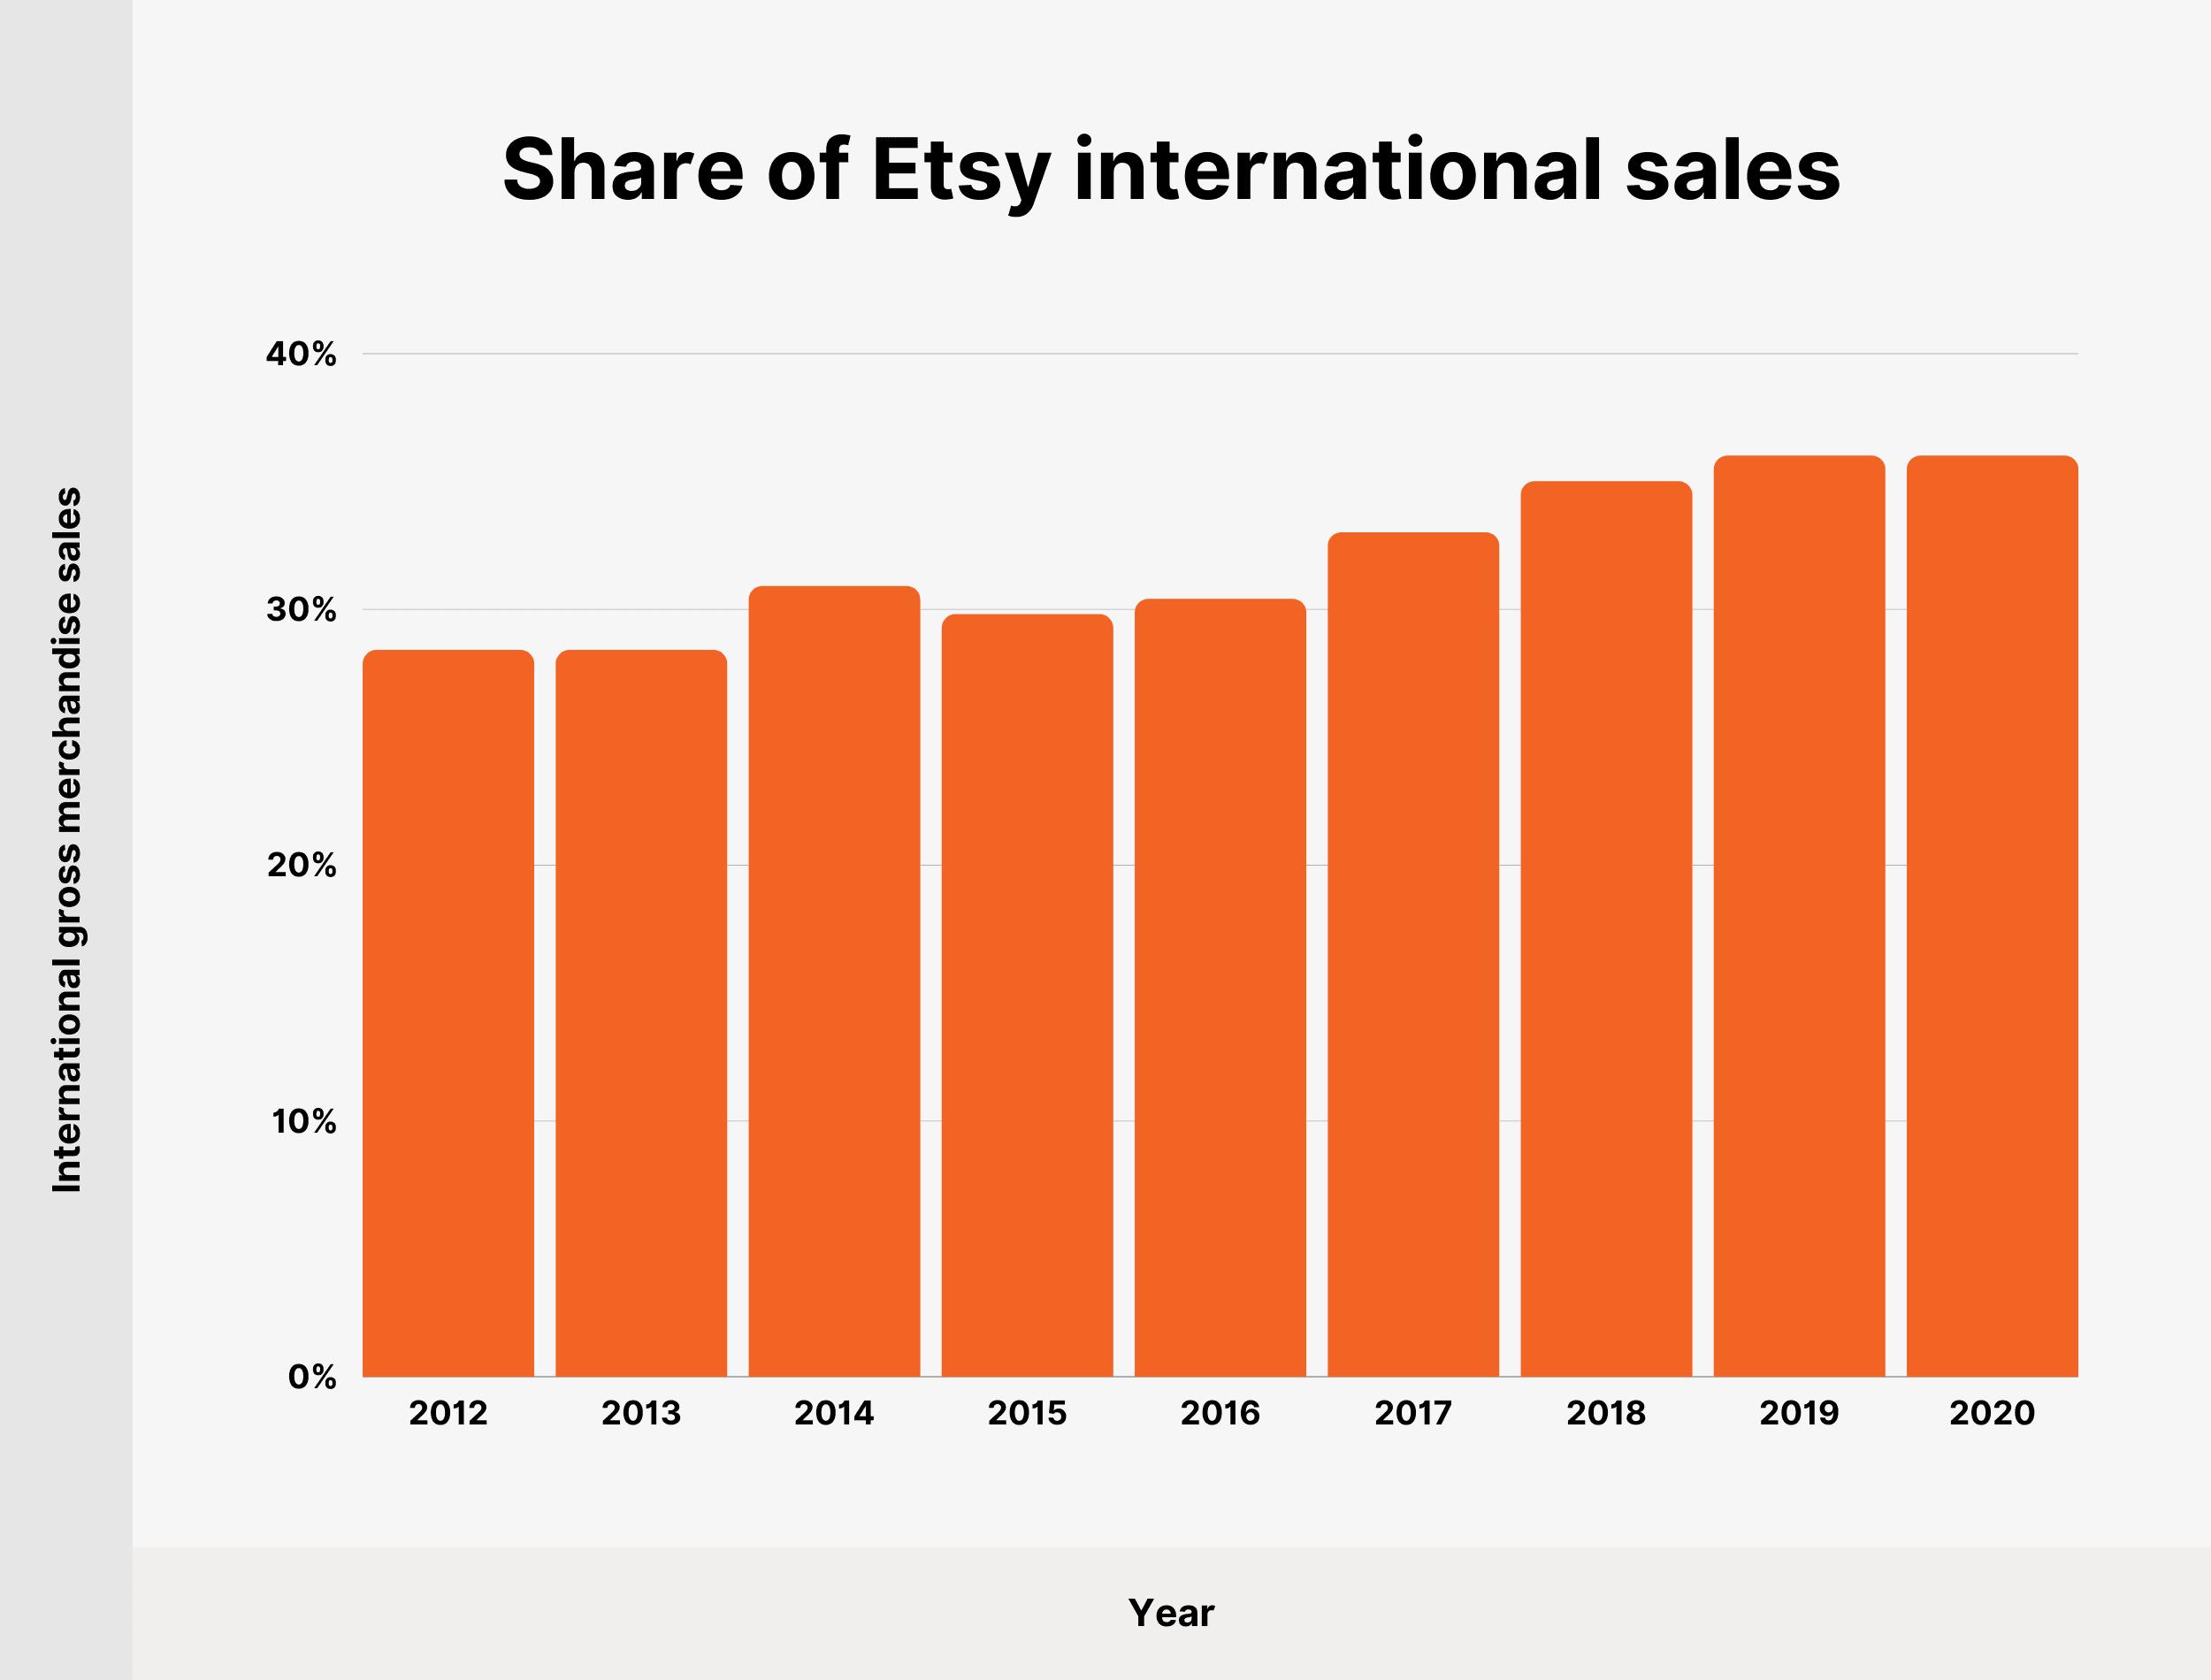 Share of Etsy international sales